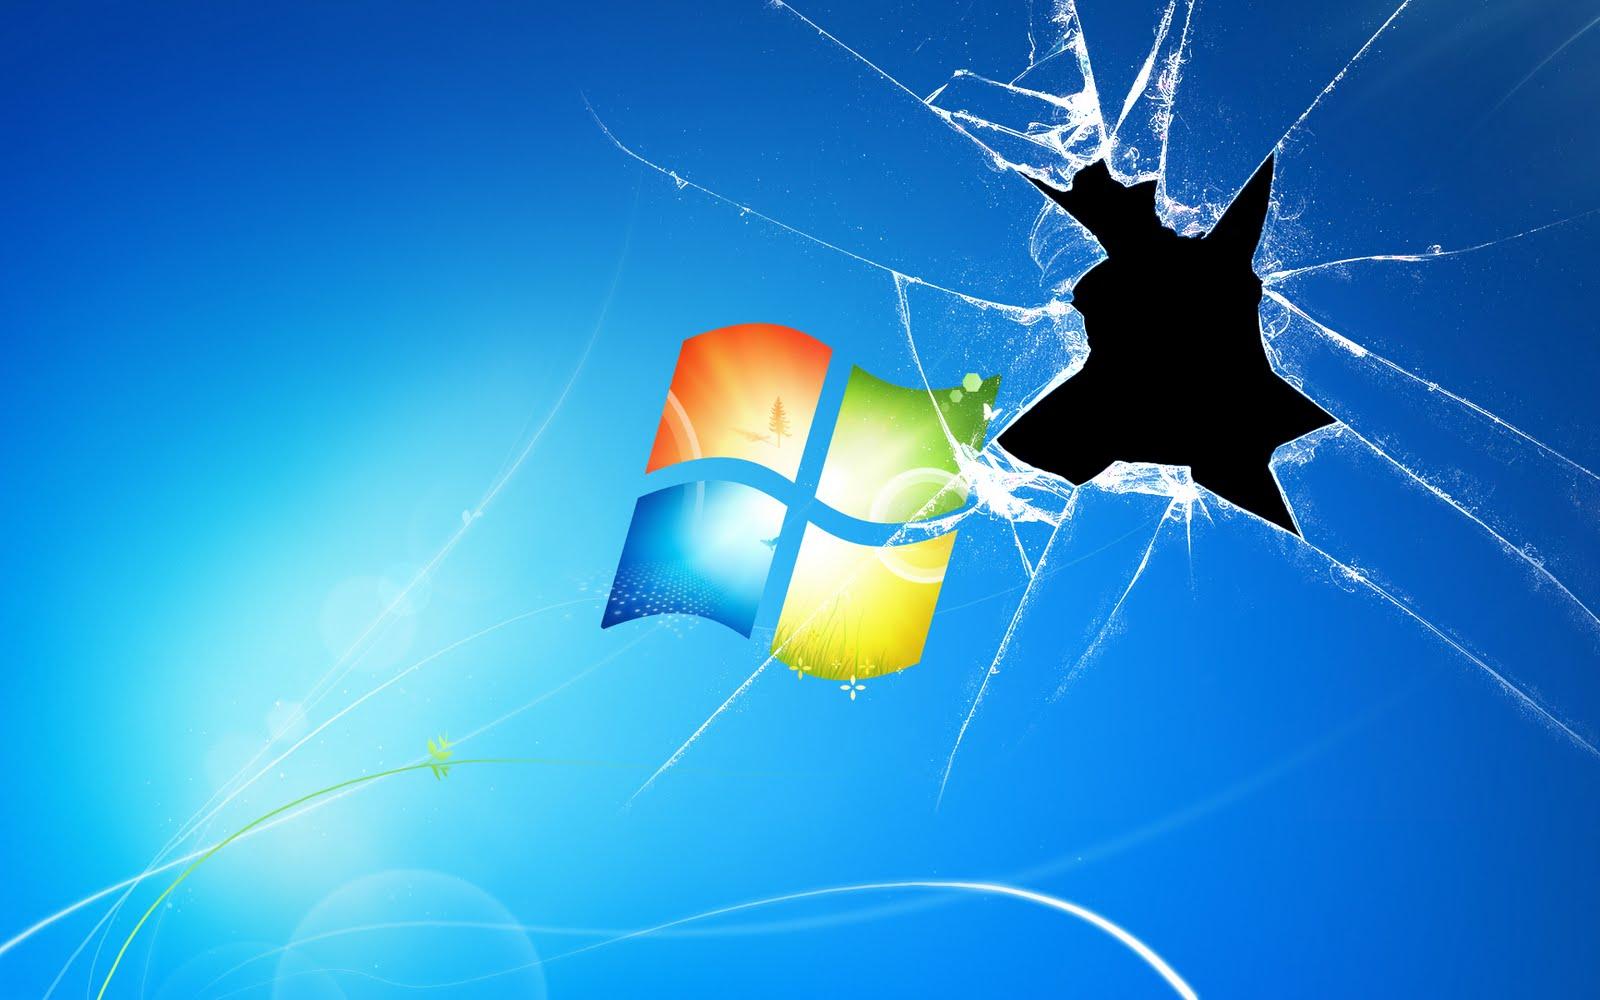 http://3.bp.blogspot.com/-lApk2vwE33w/UNrpyiz_vqI/AAAAAAAAAM0/lBY8qZWHhkU/s1600/Broken_Windows_7_hd_wallpaper_1920x1200.jpg